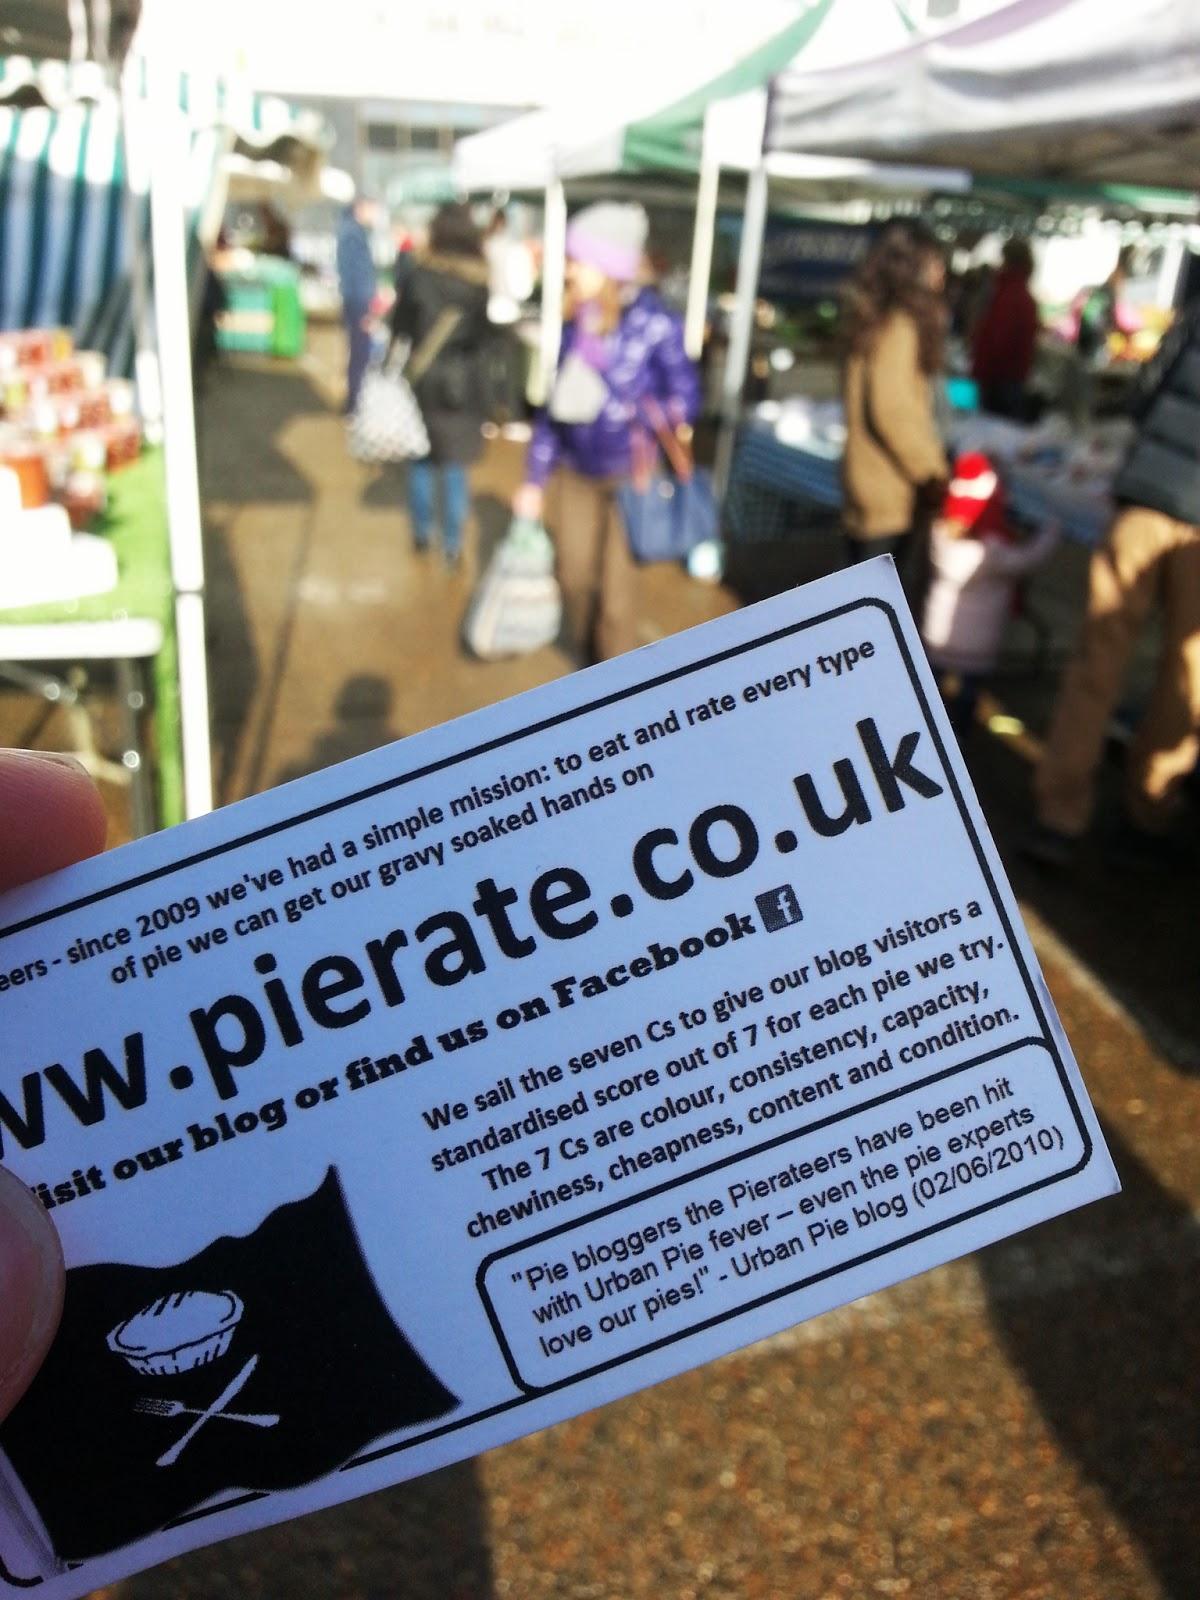 Pierate - Pie Reviews: Best pie in the world? 150 pie reviews!